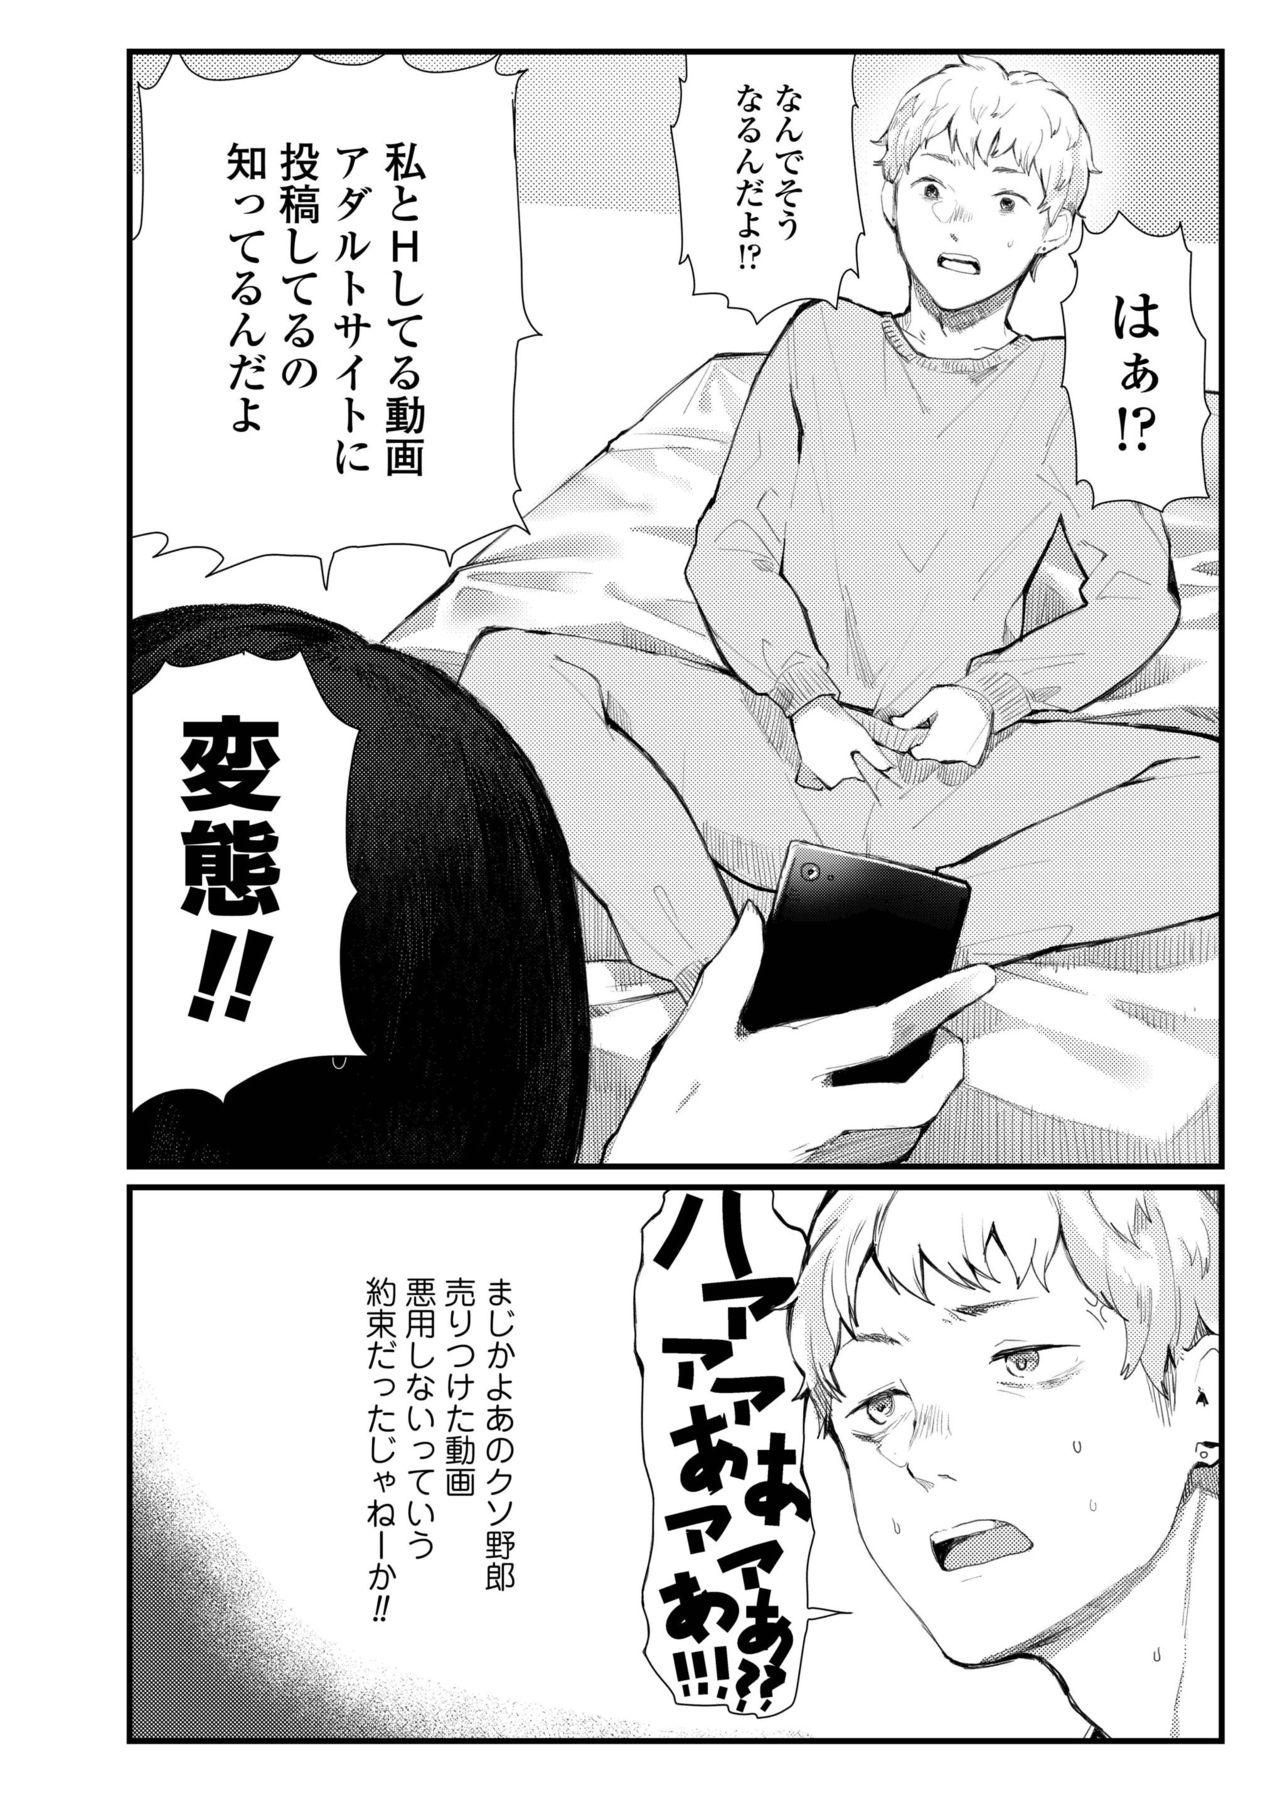 COMIC AOHA 2019 Haru 475